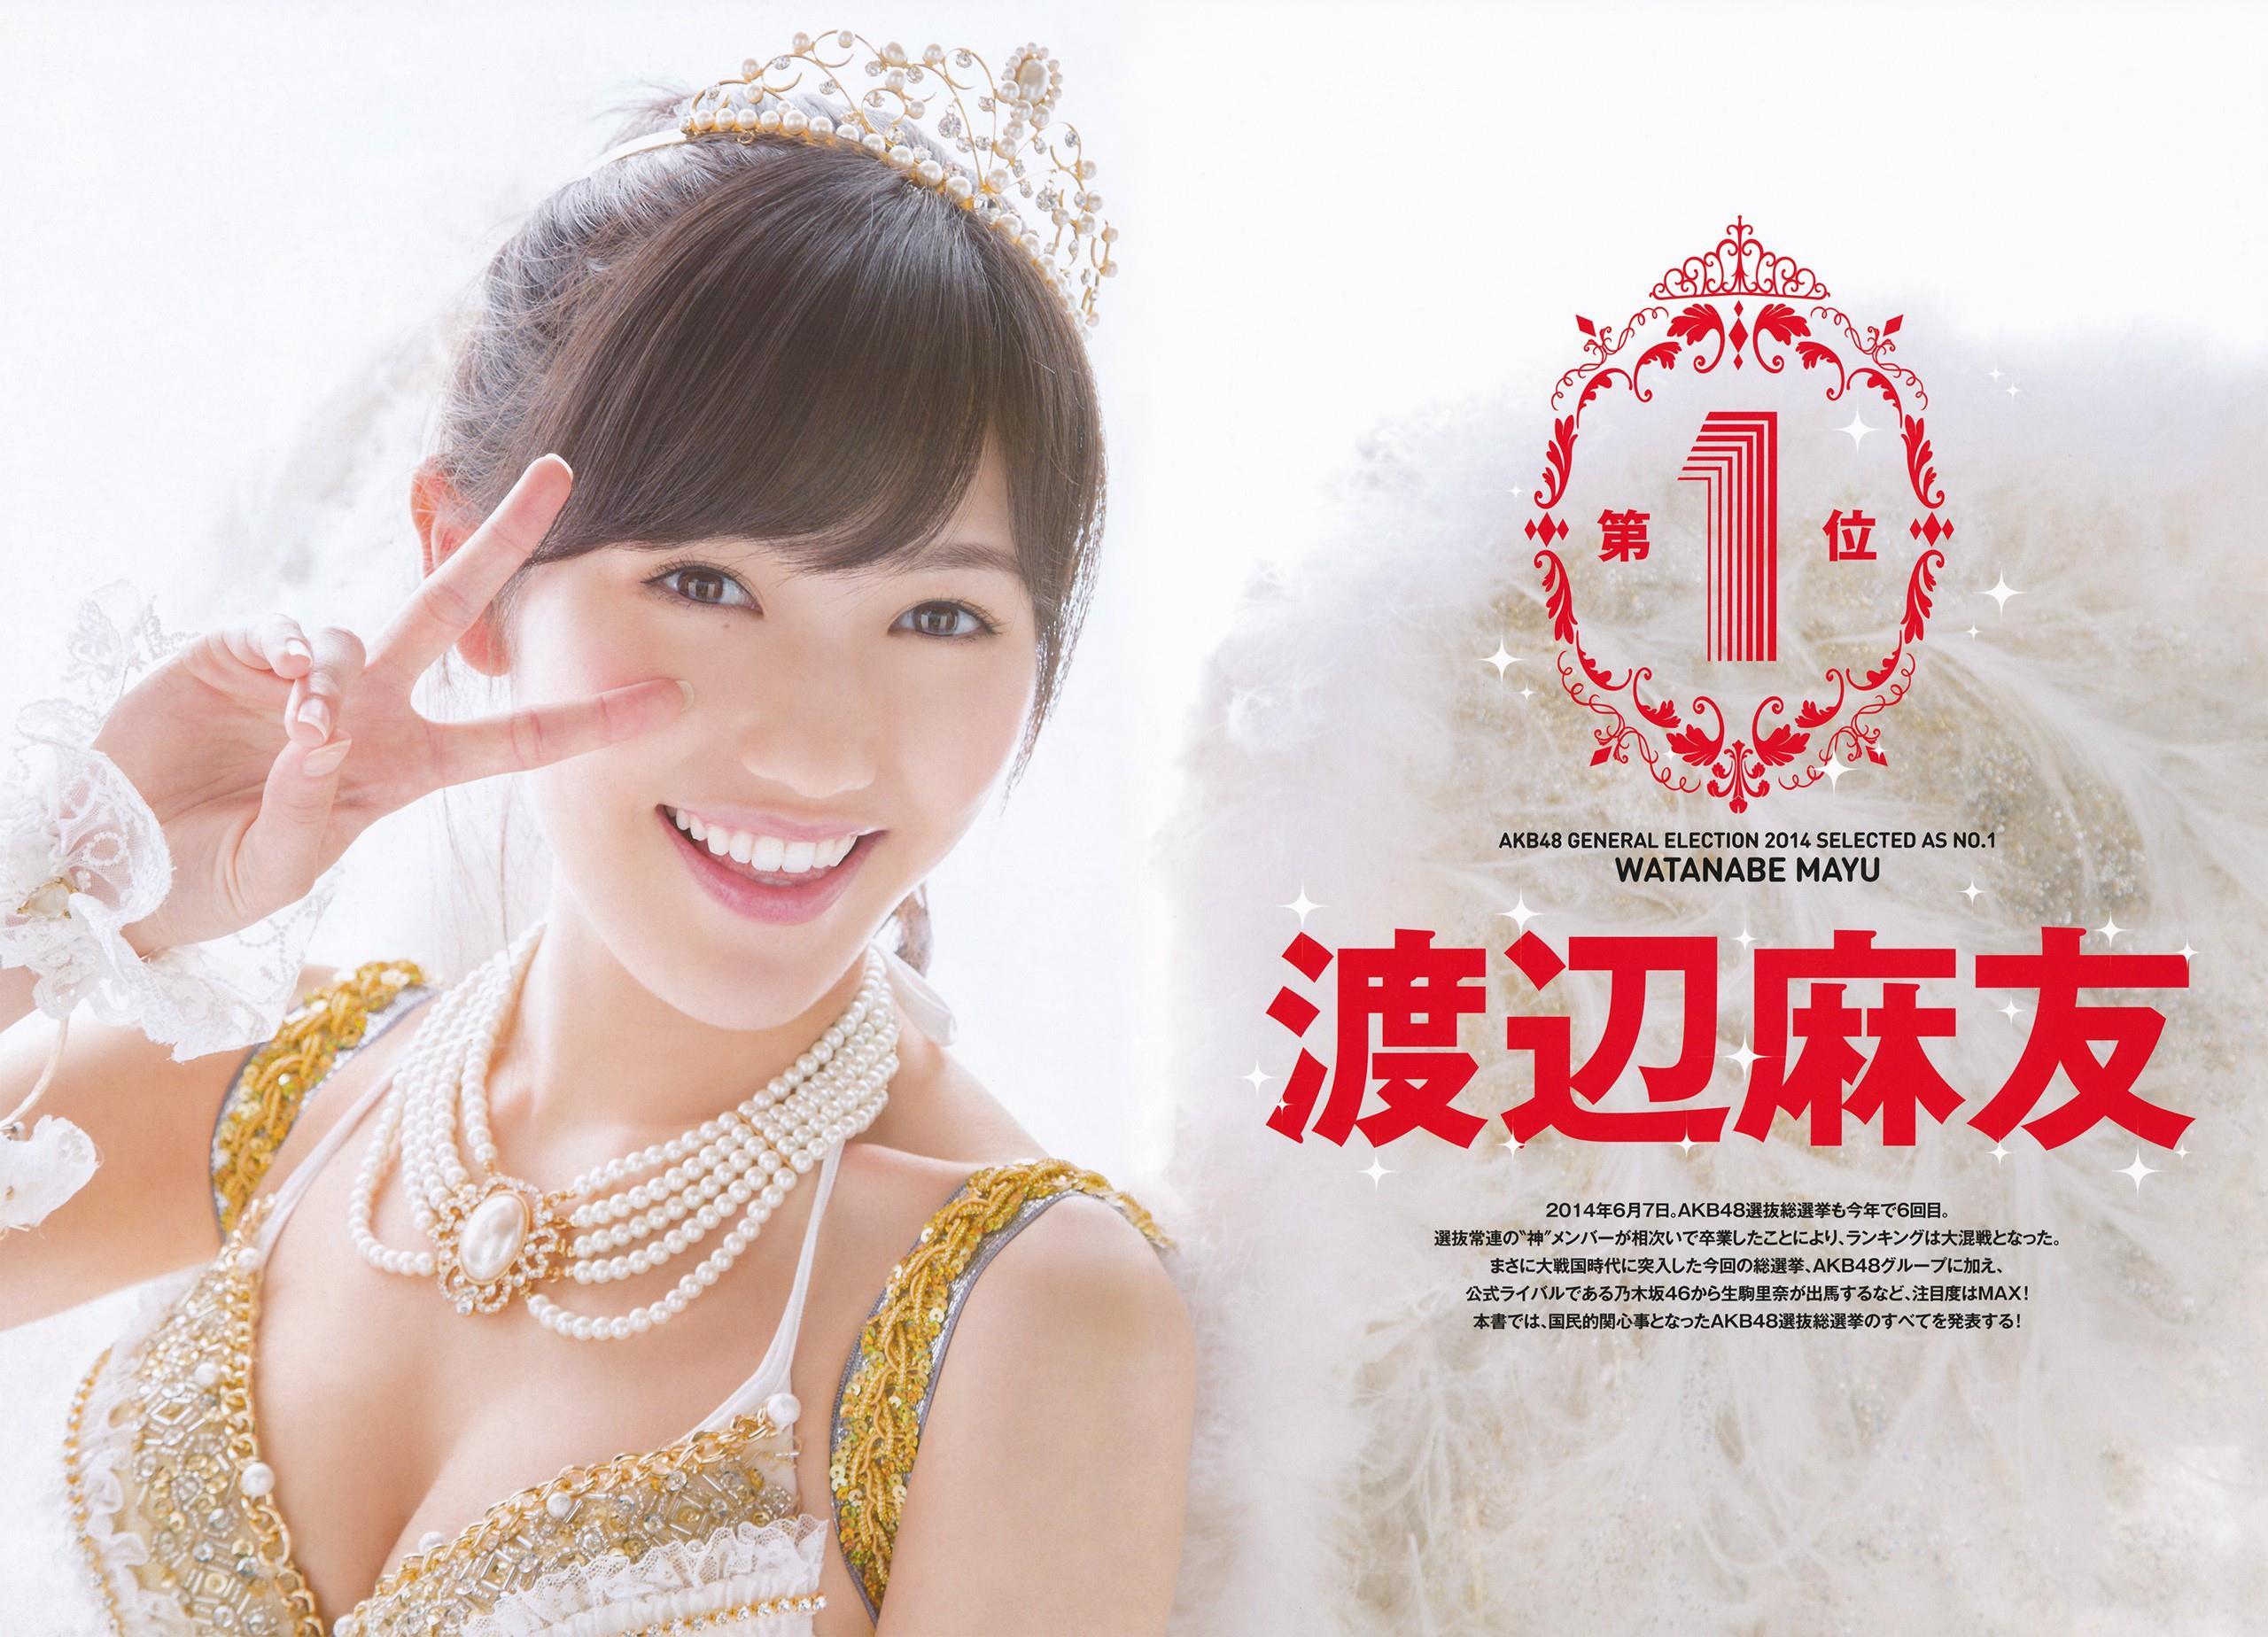 AKB48人気メンバー 画像 16